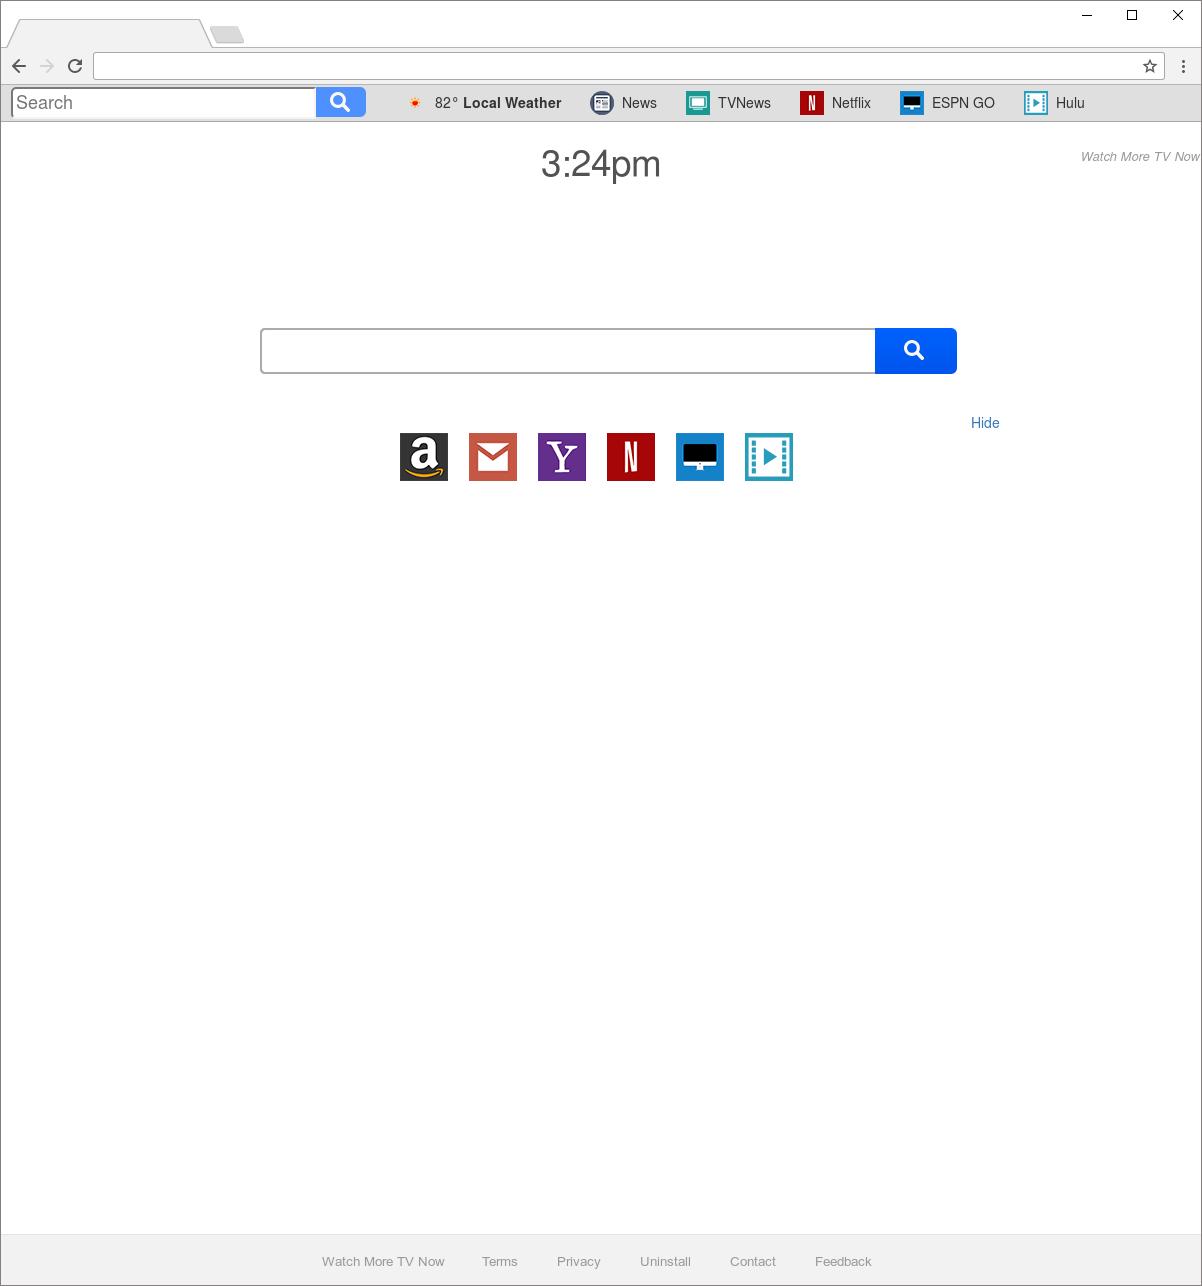 Search.searchwmtn2.com Hijacker